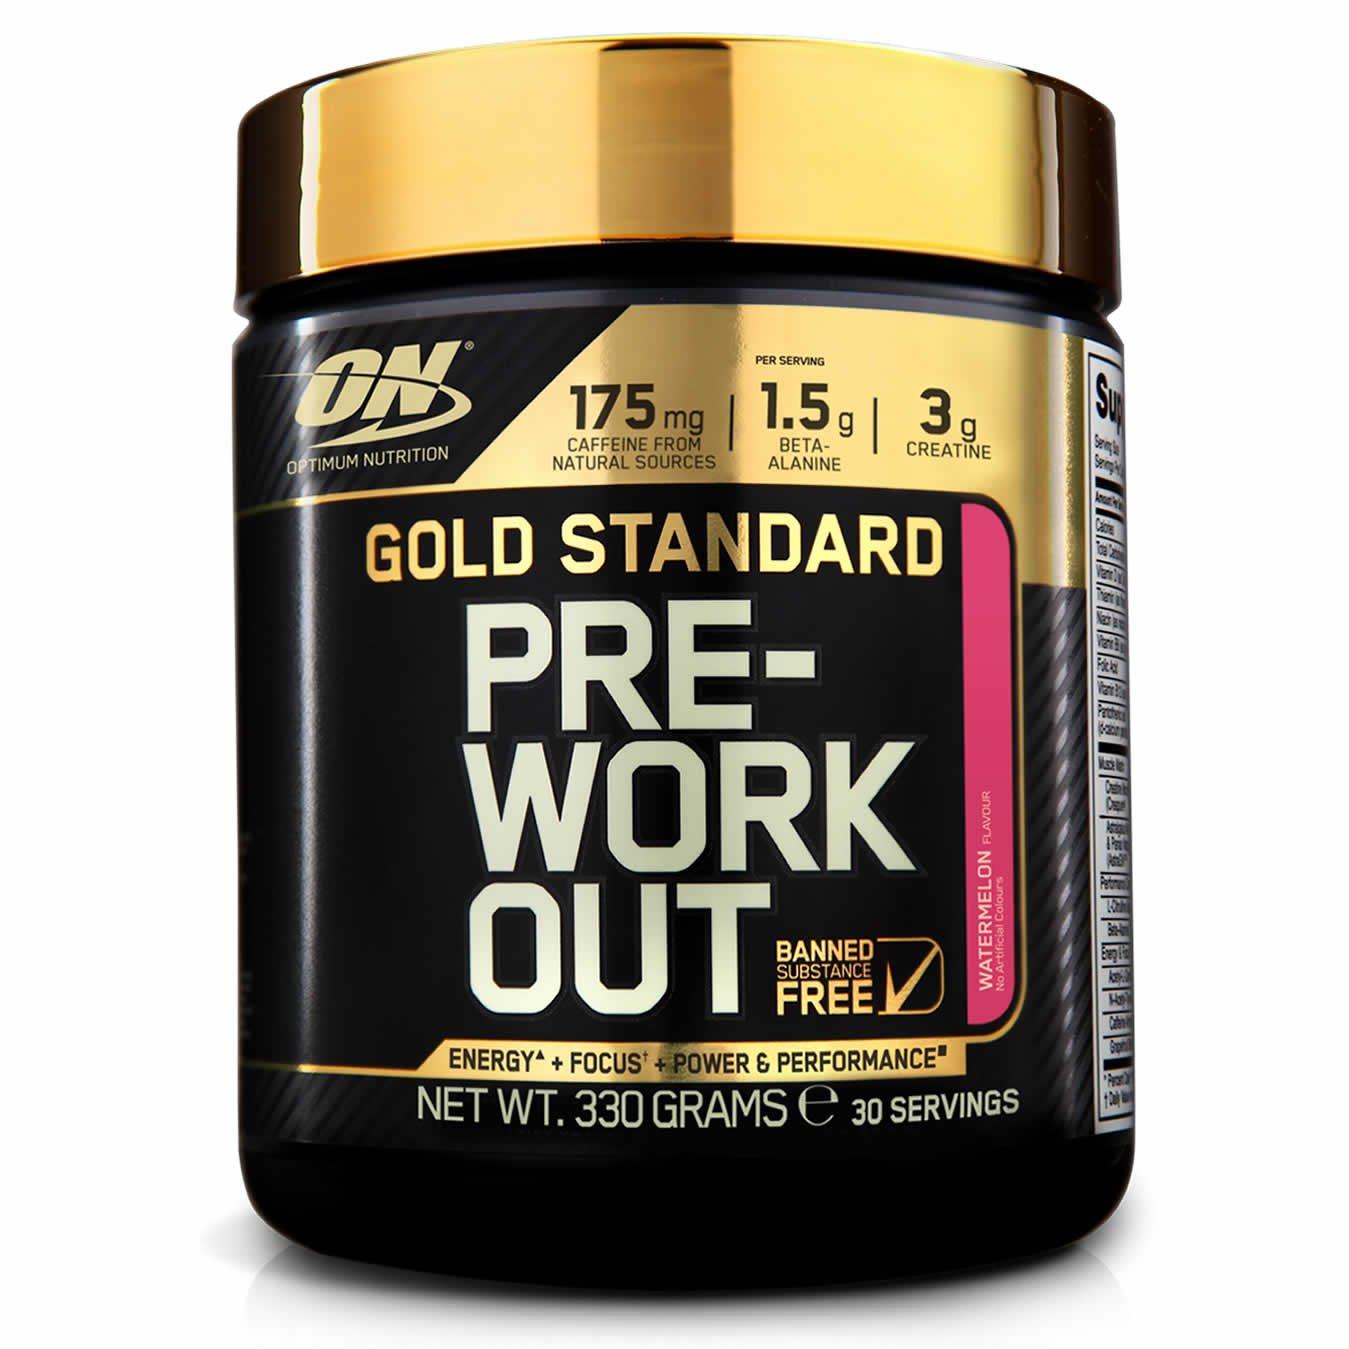 bd9e0390a Optimum Nutrition Gold Standard Pre-Workout Supplement – My Protein ...